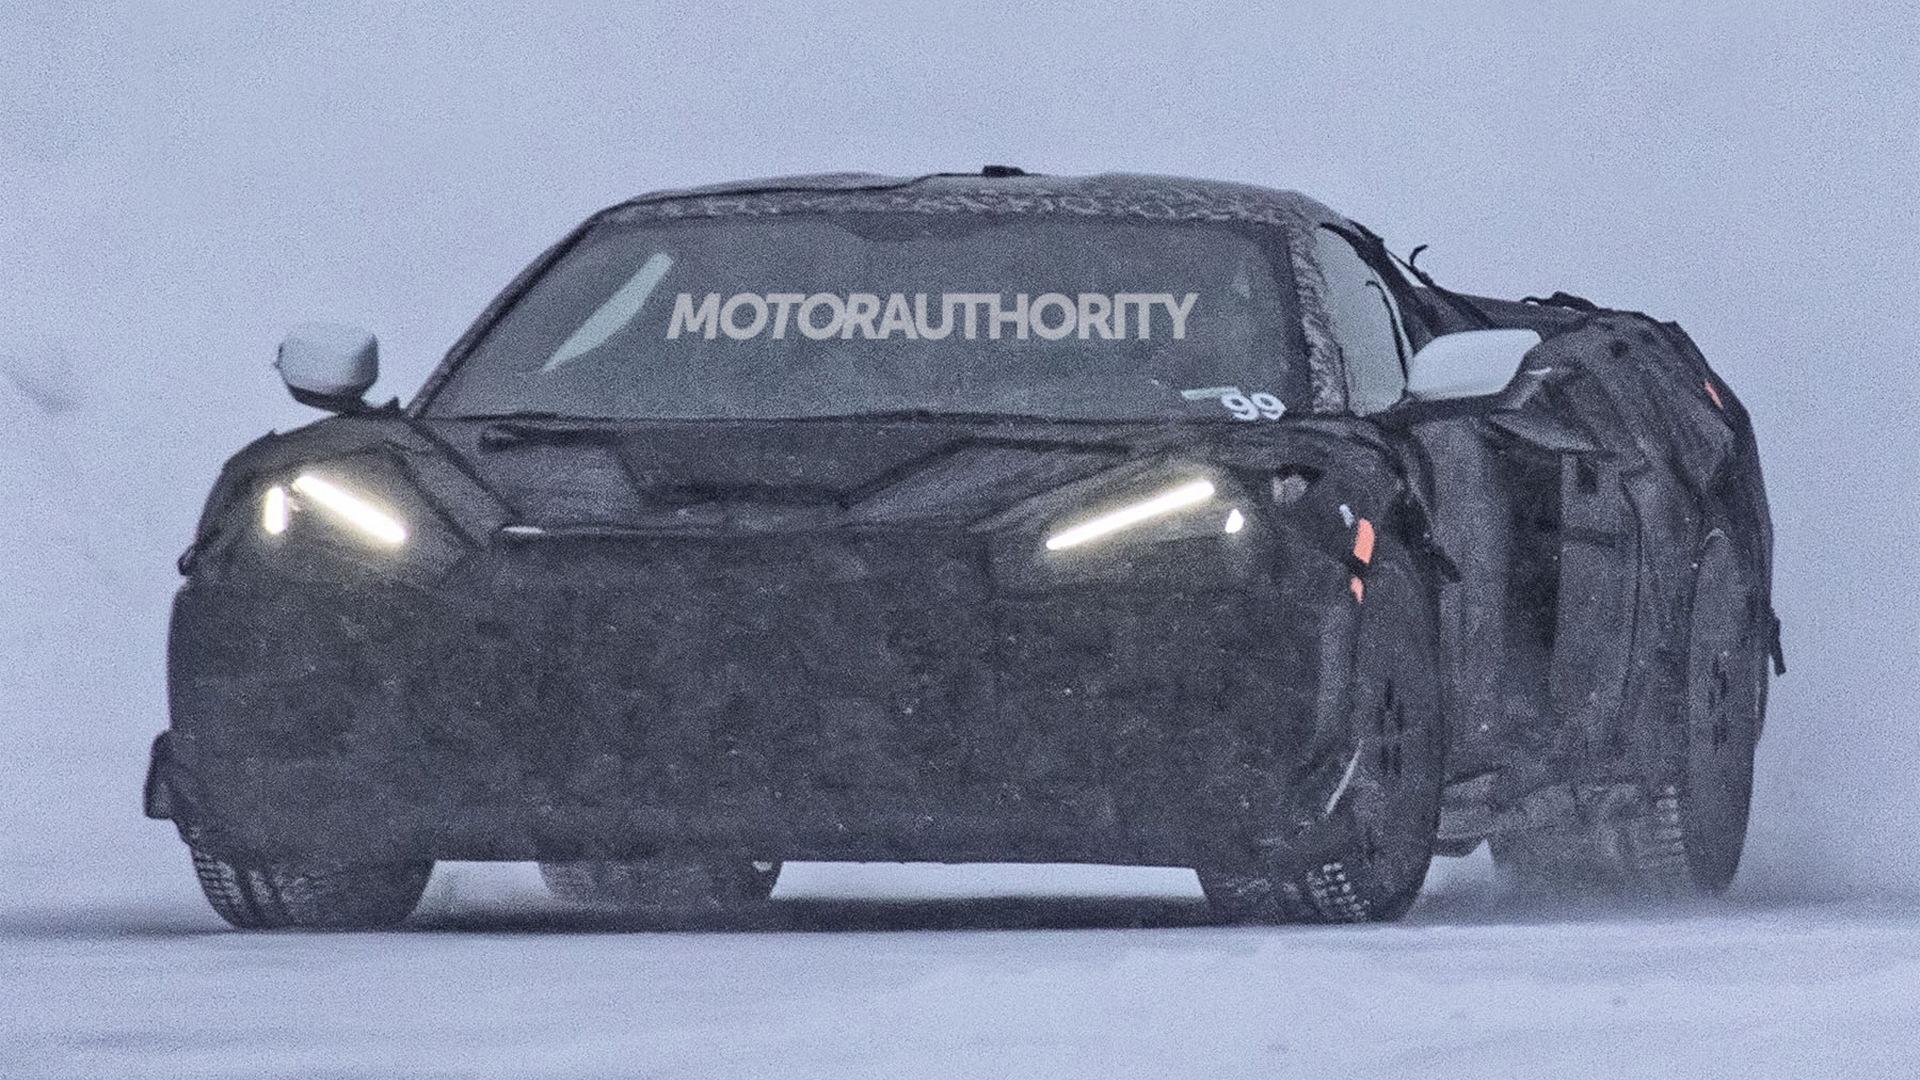 2022 Chevrolet Corvette Z06 spy shots - Photo credit: S. Baldauf/SB-Medien